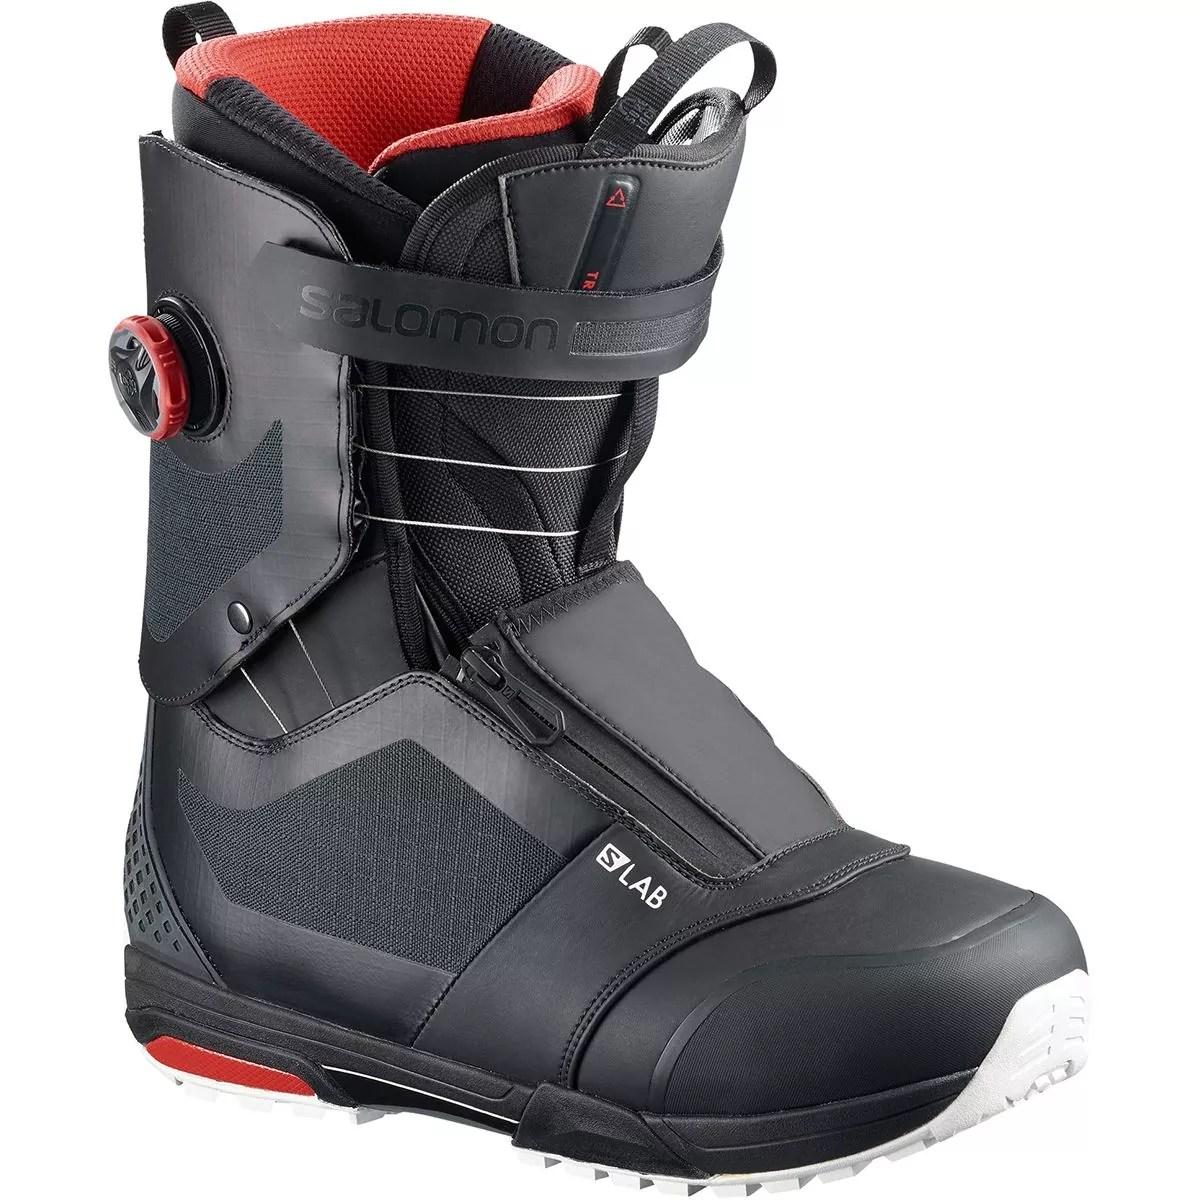 Salomon Snowboards Trek SLab Snowboard Boot